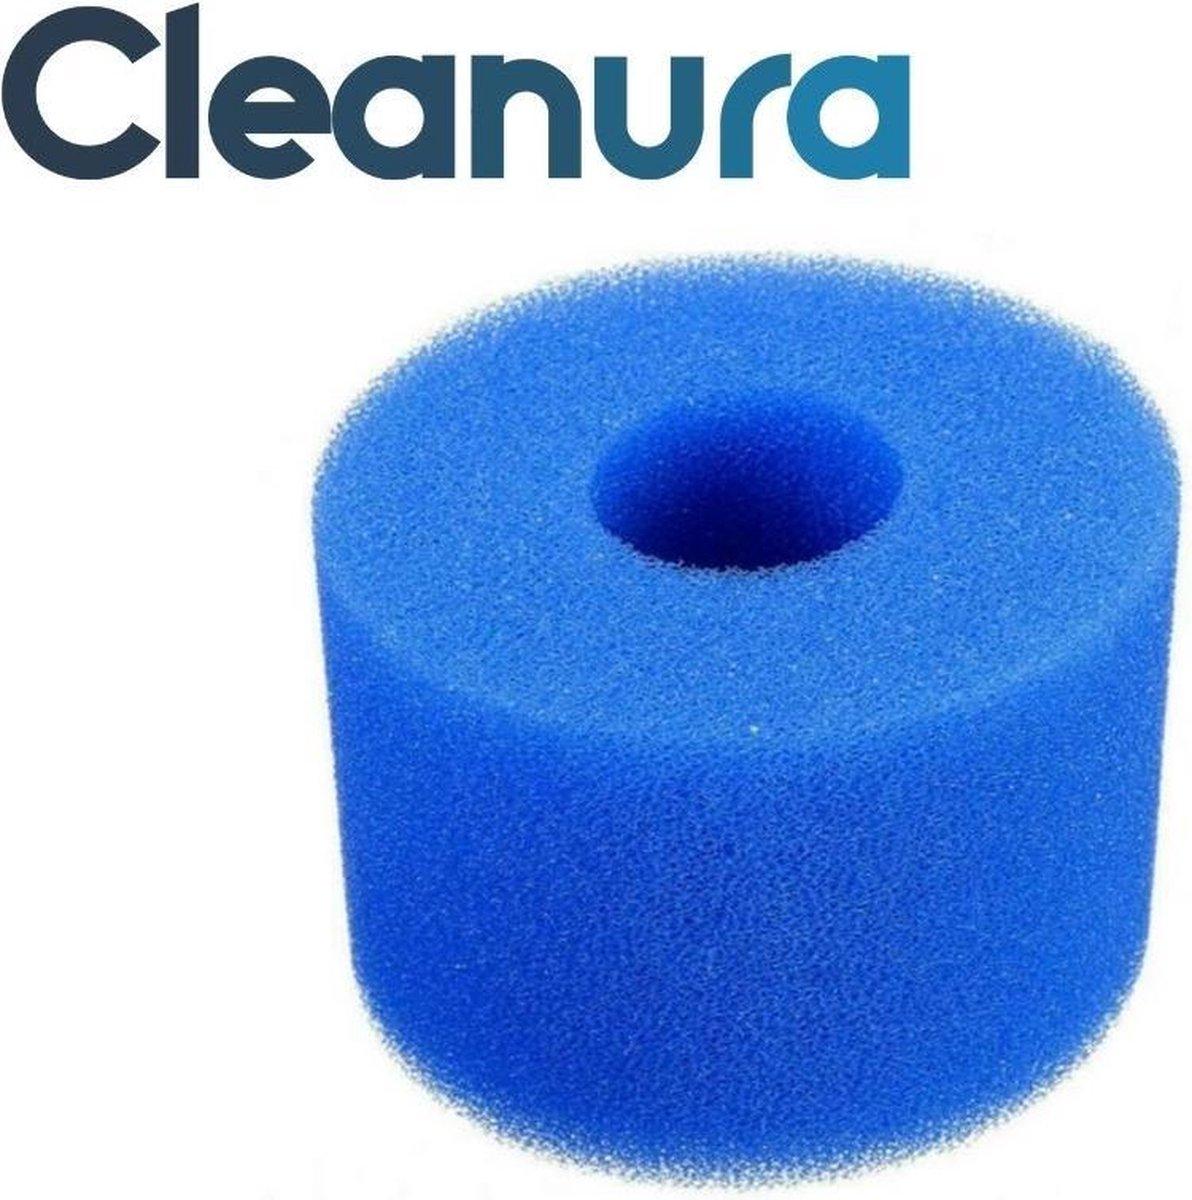 Cleanura 3 x Filter Type S1 of VI - zwembad filter - Herbruikbaar - spons filter - zwembadfilter - incl E-book